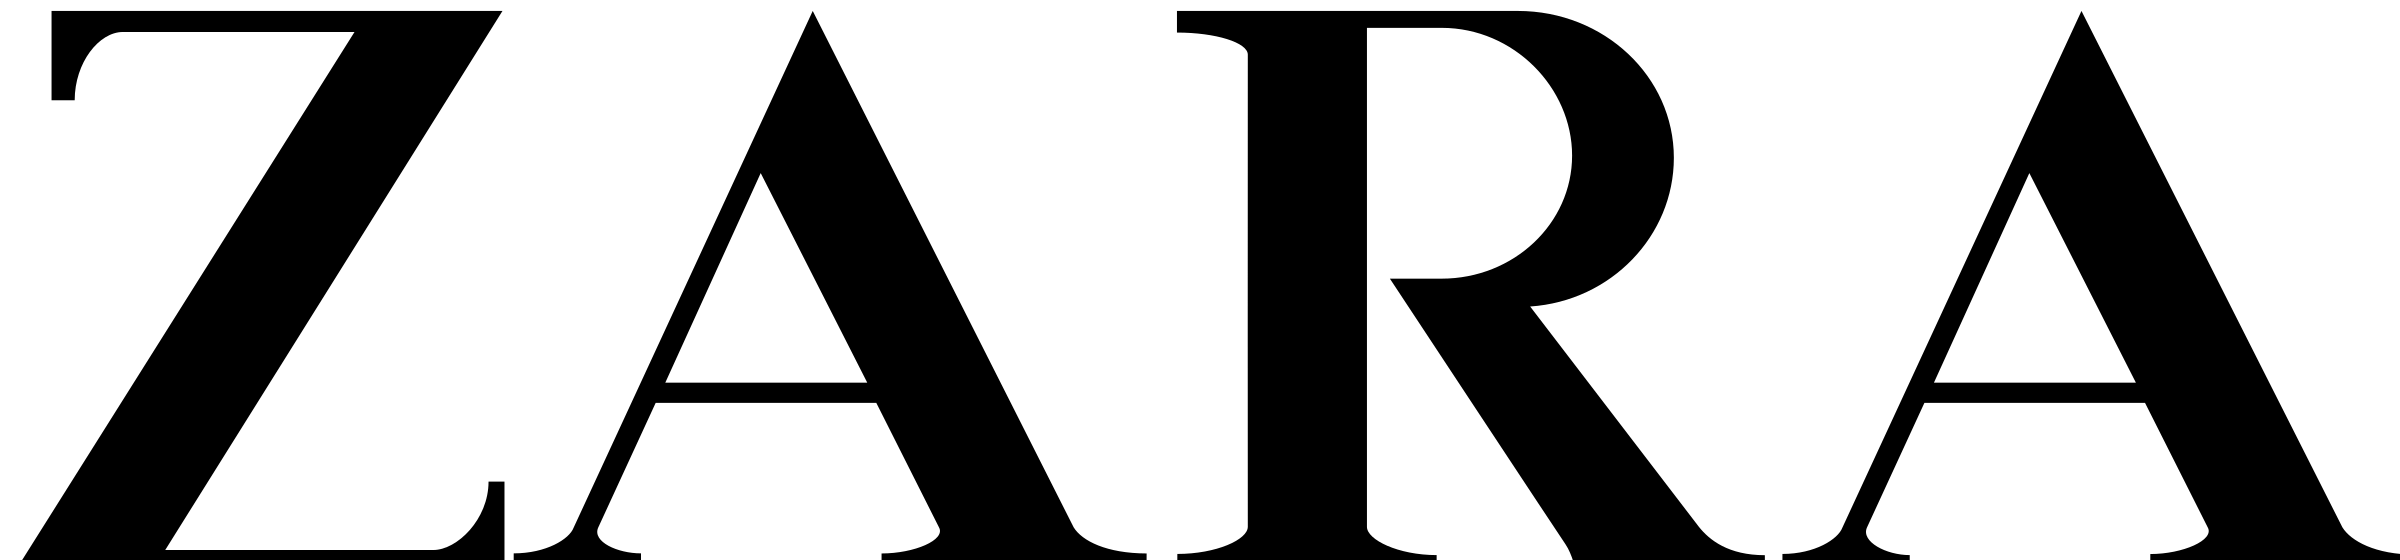 Zara Logo PNG Transparent & SVG Vector.